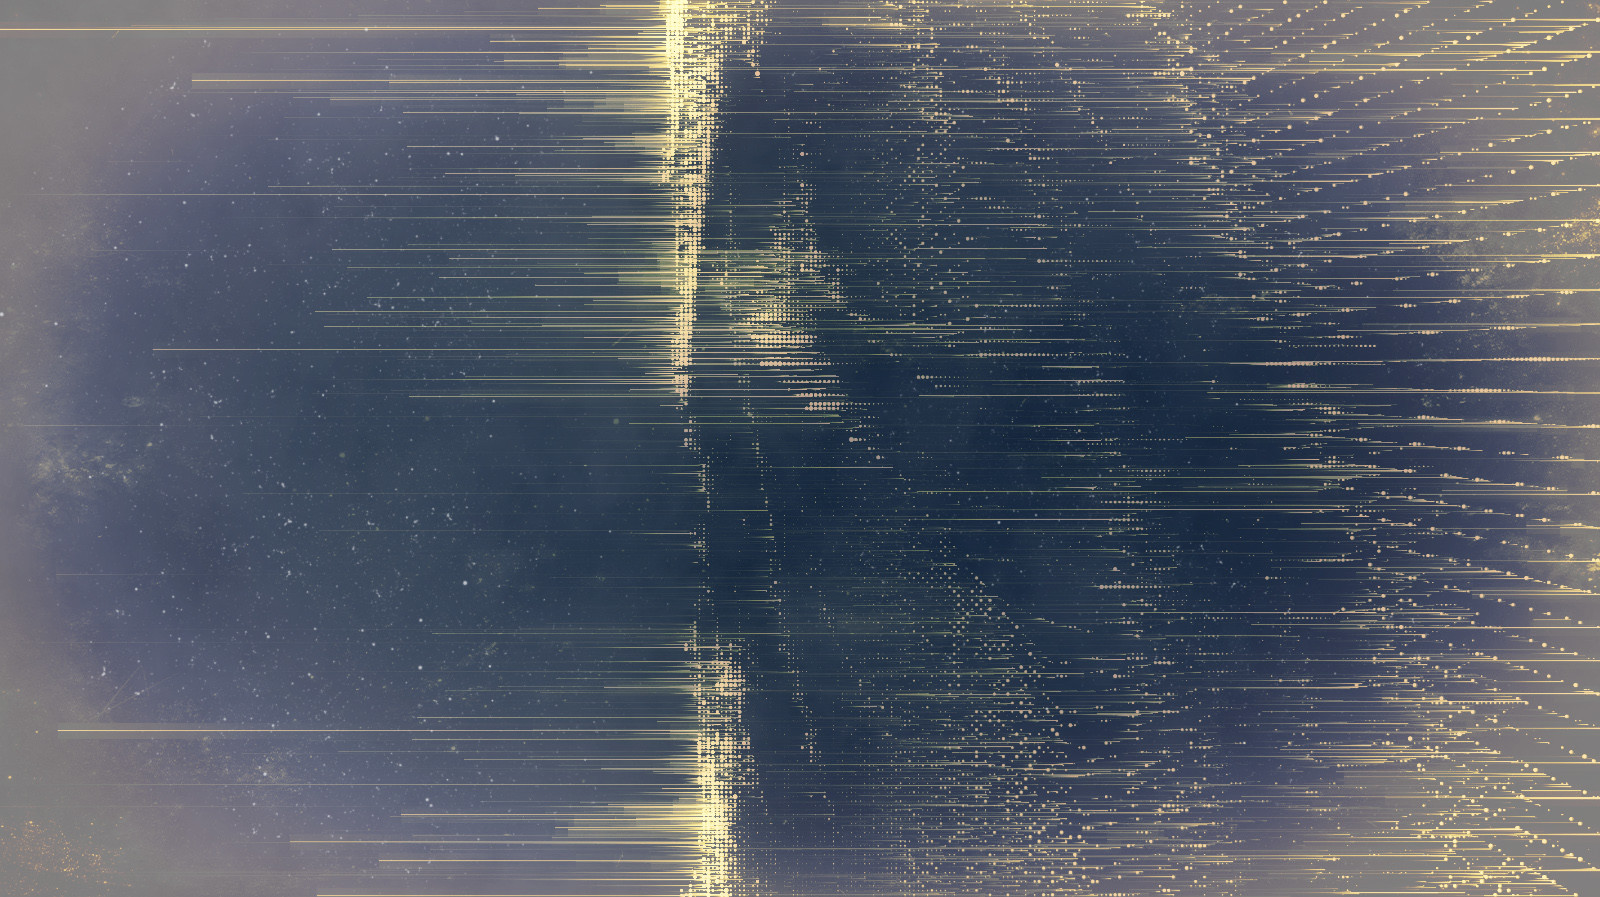 Kresimir jelusic robob3ar 342 190916